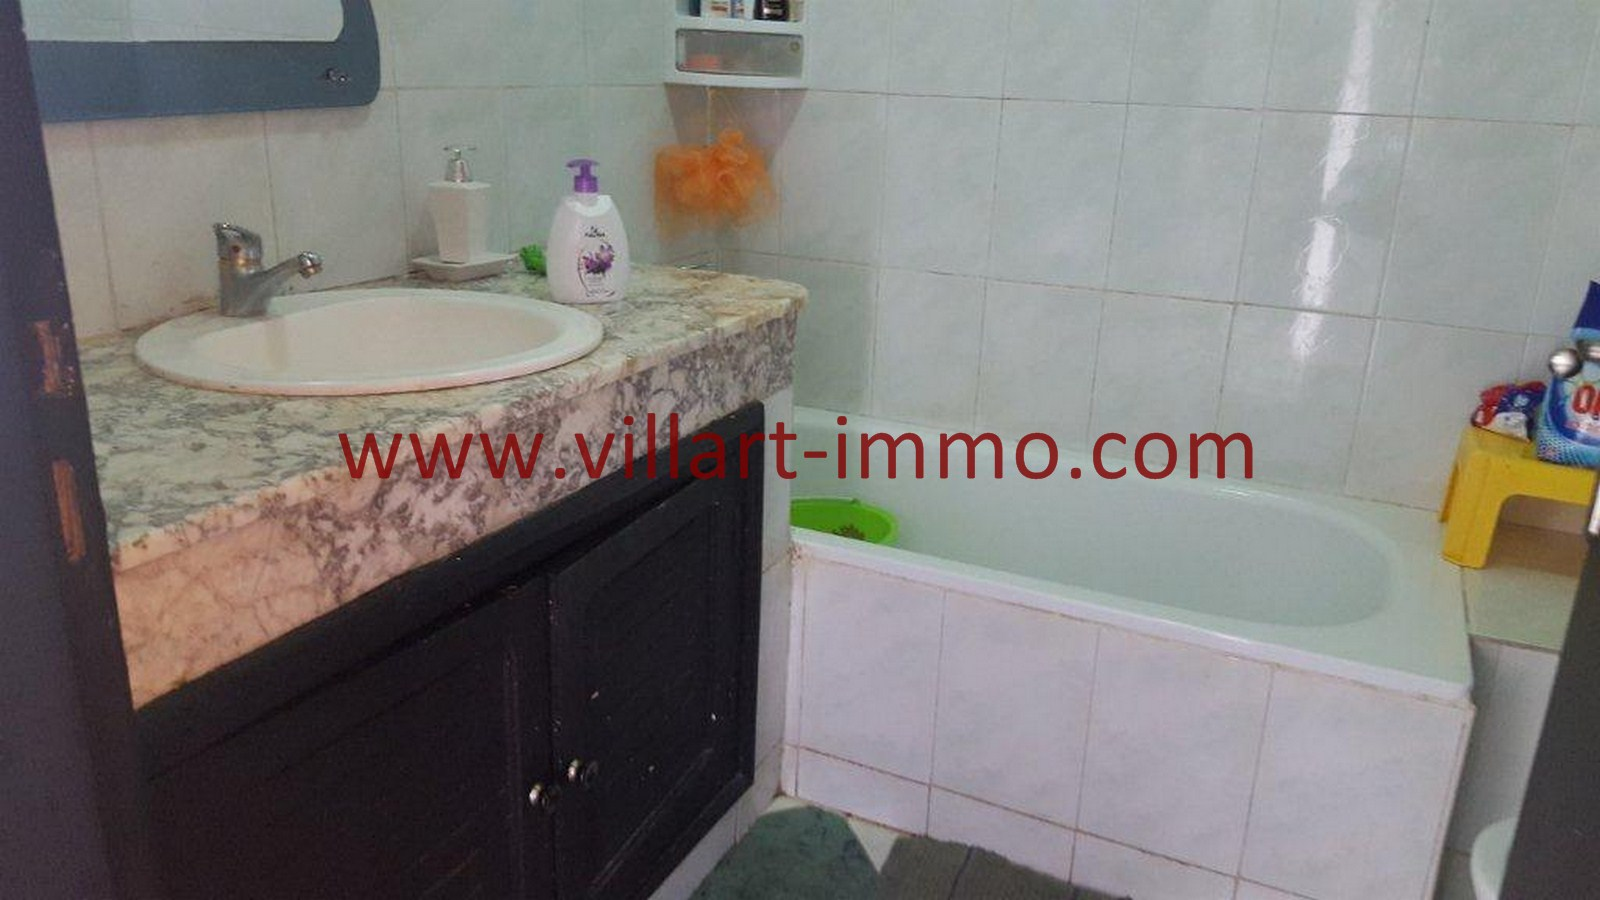 7-Vente-Appartement-Tanger-Malabata-Salle de bain-VA507-Villart Immo